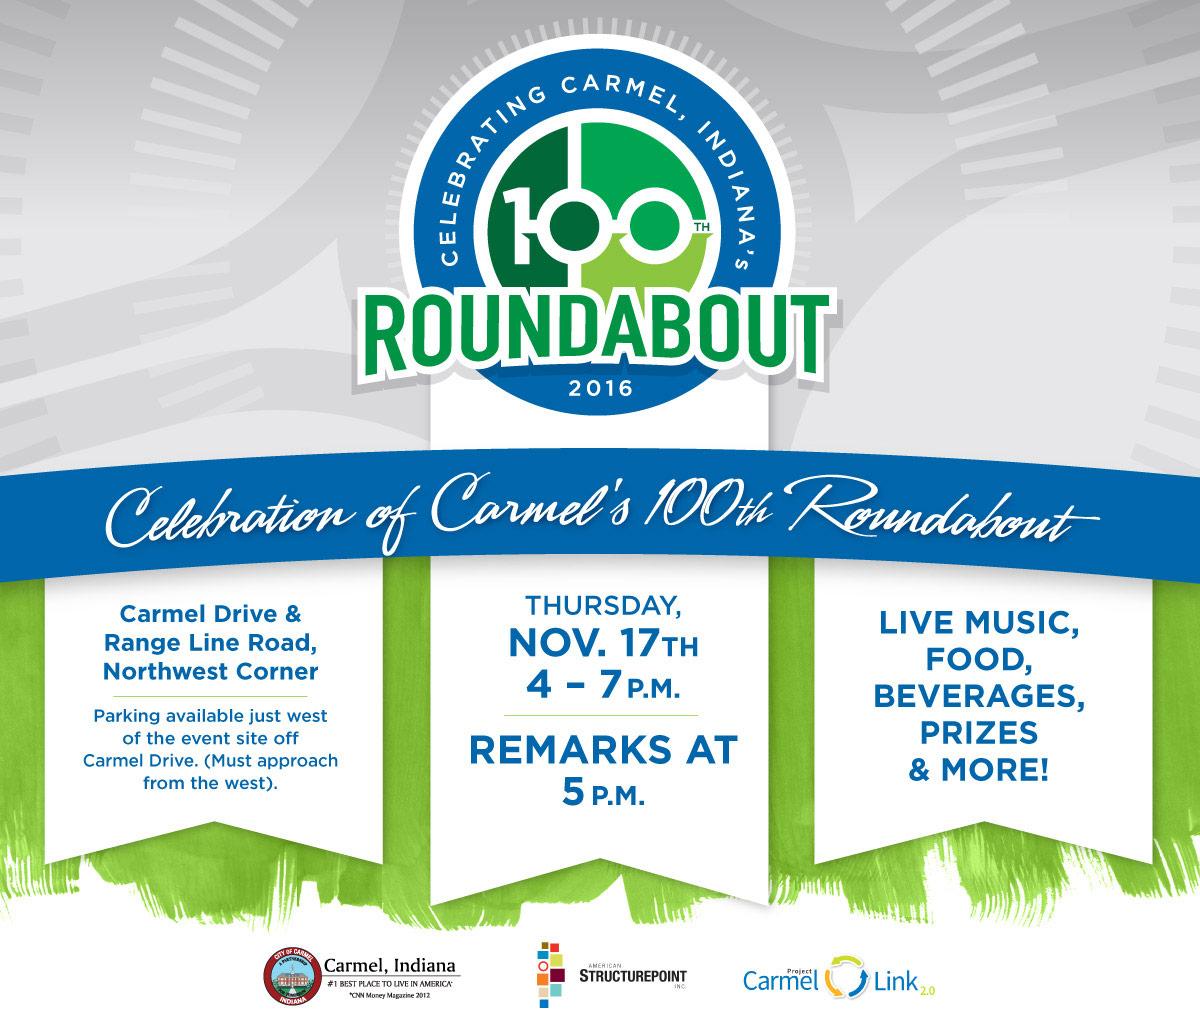 Carmel Roundabout